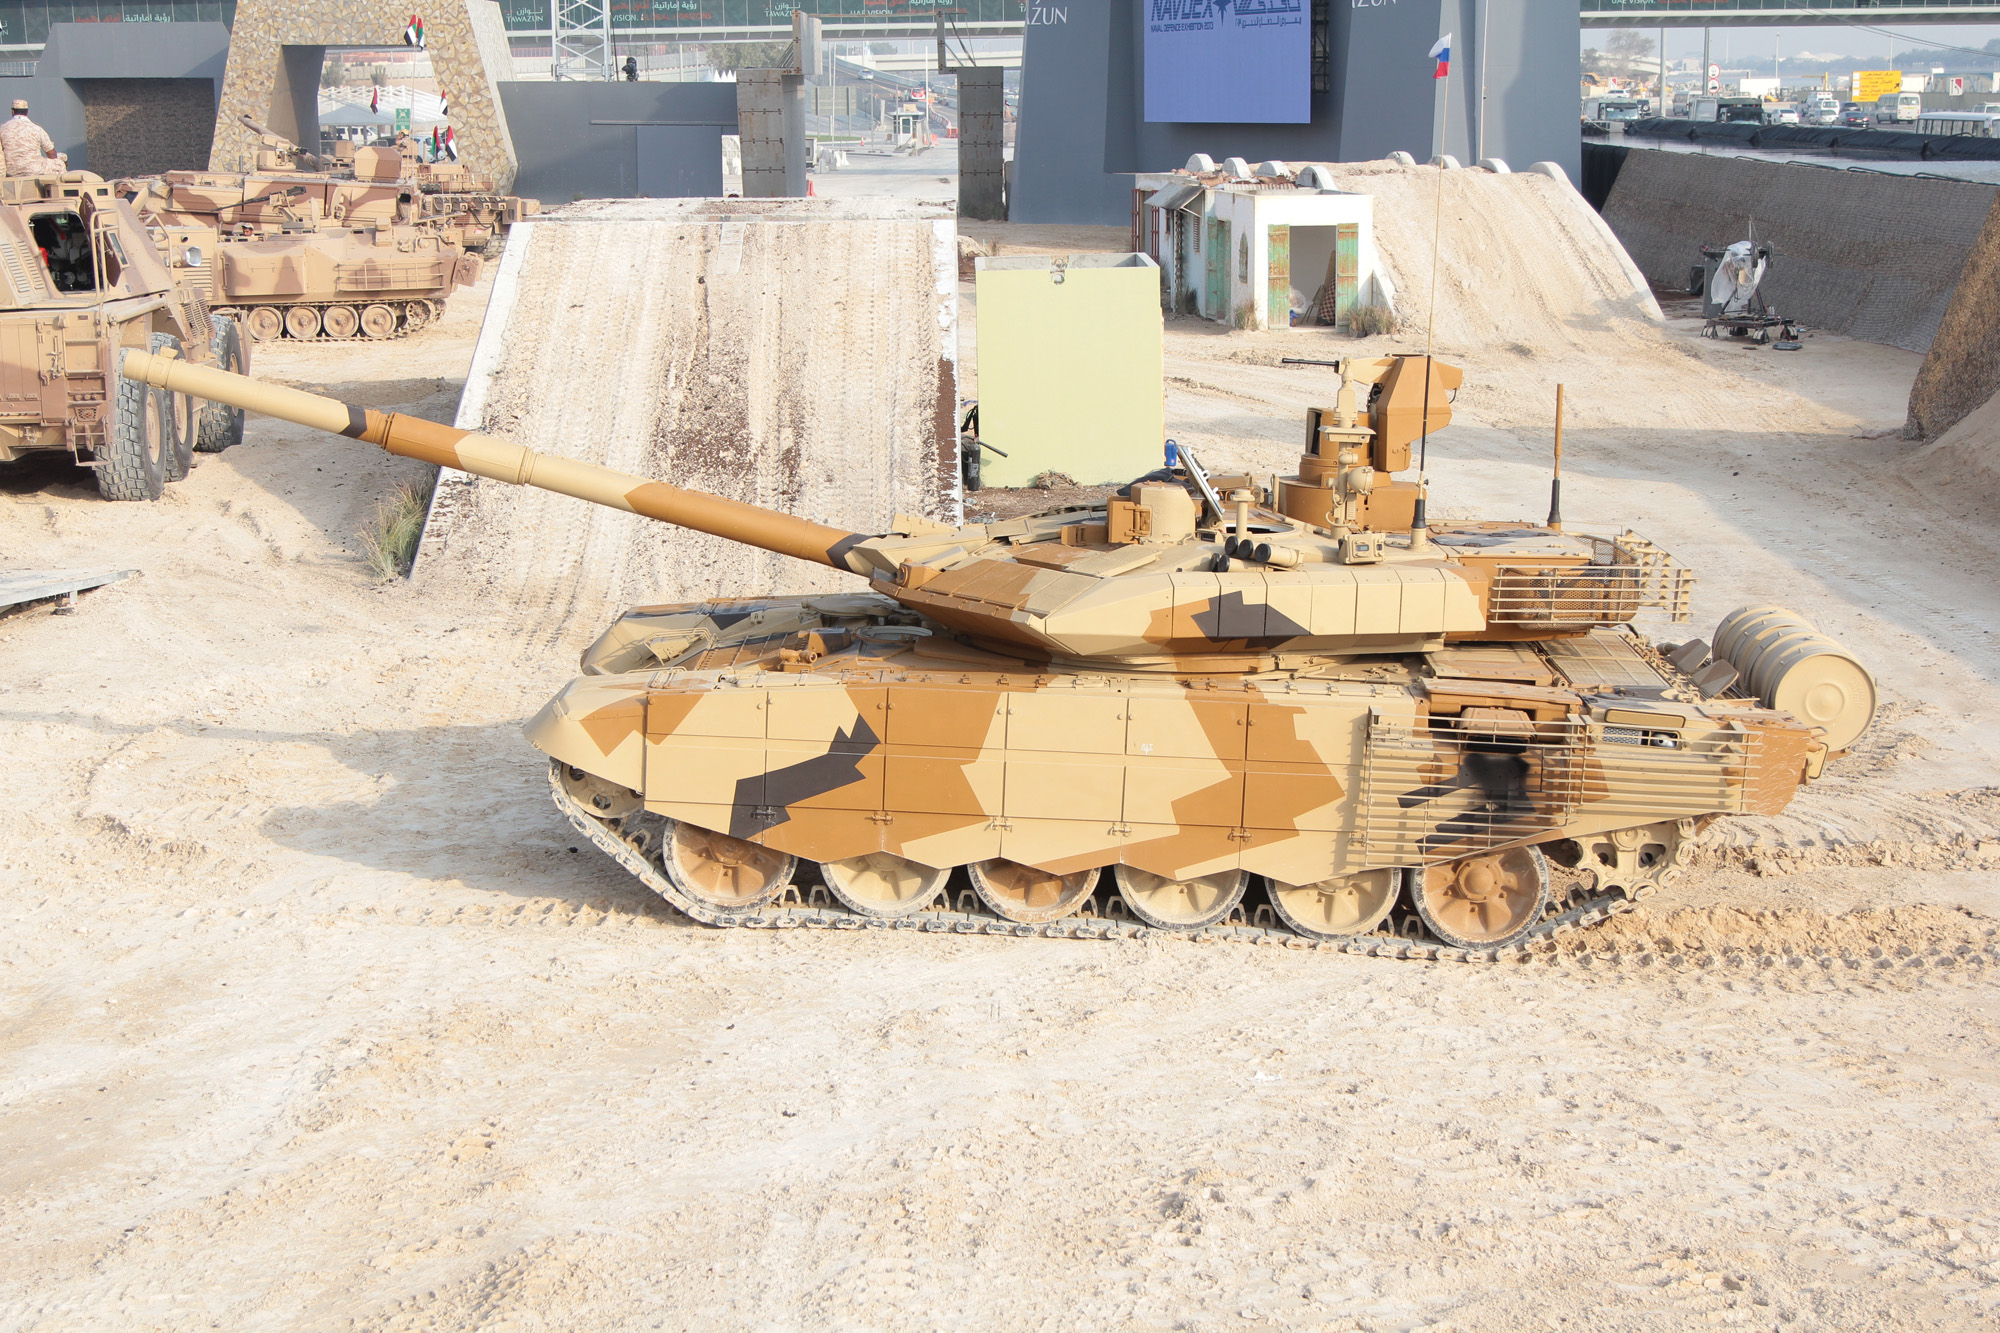 El tanque ruso T-90 3199748_original